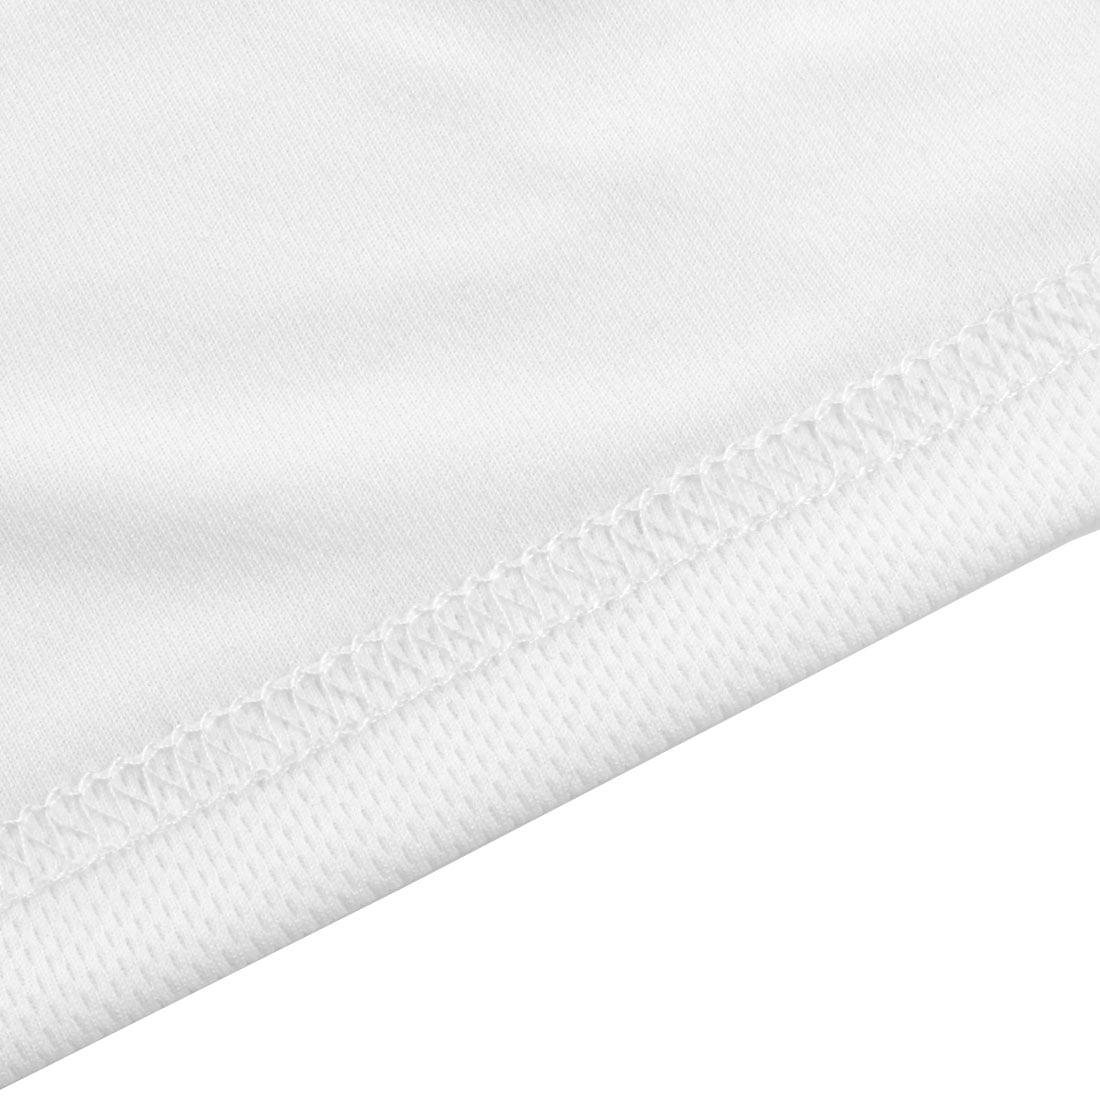 Men Exercise Marathon Polyester Short Sleeve Sports T-shirt White L/L (US 42) - image 3 de 6